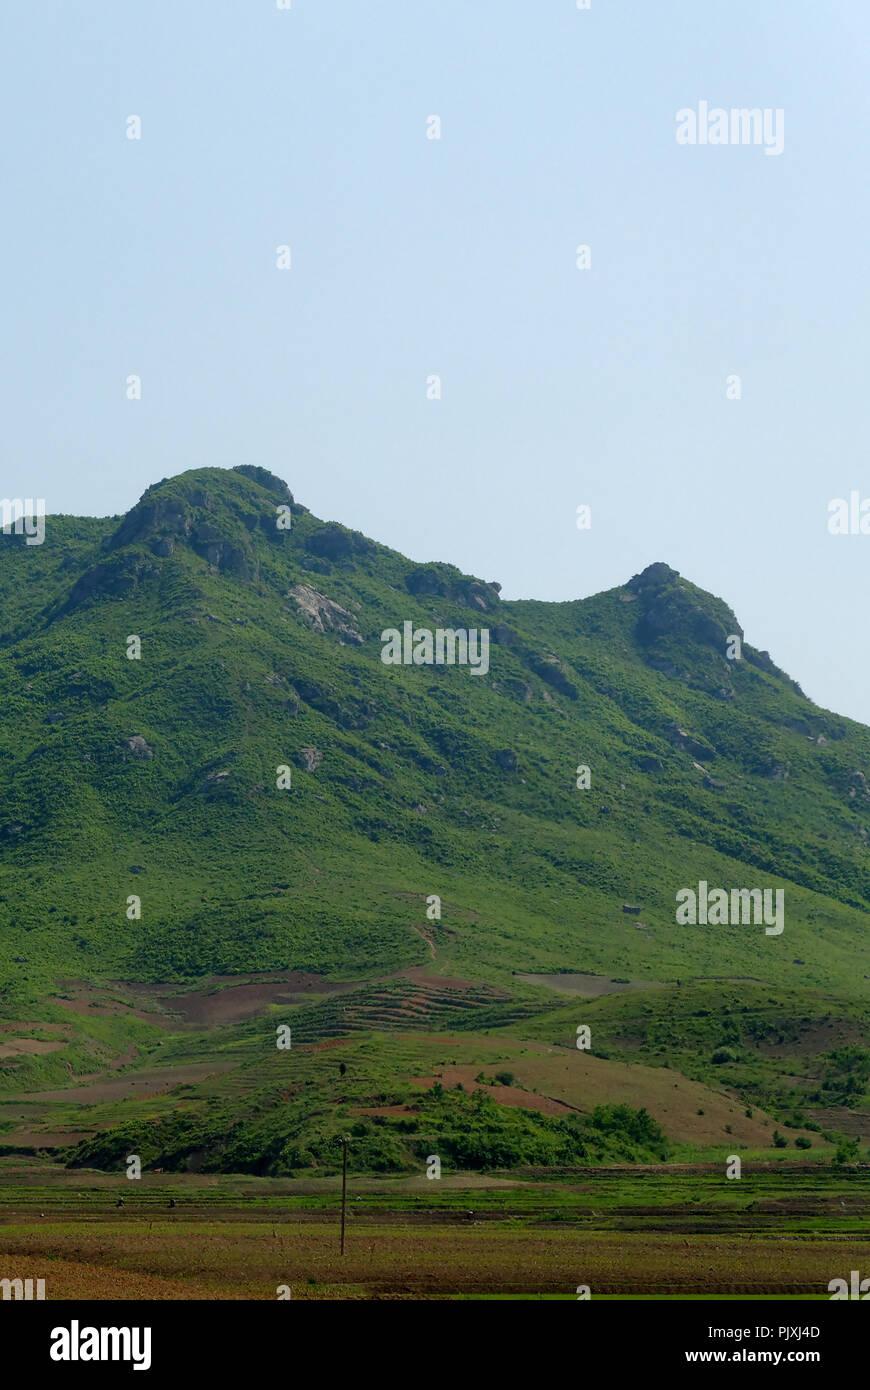 Craggy peaks of a mountain ridge, North Korea - Stock Image